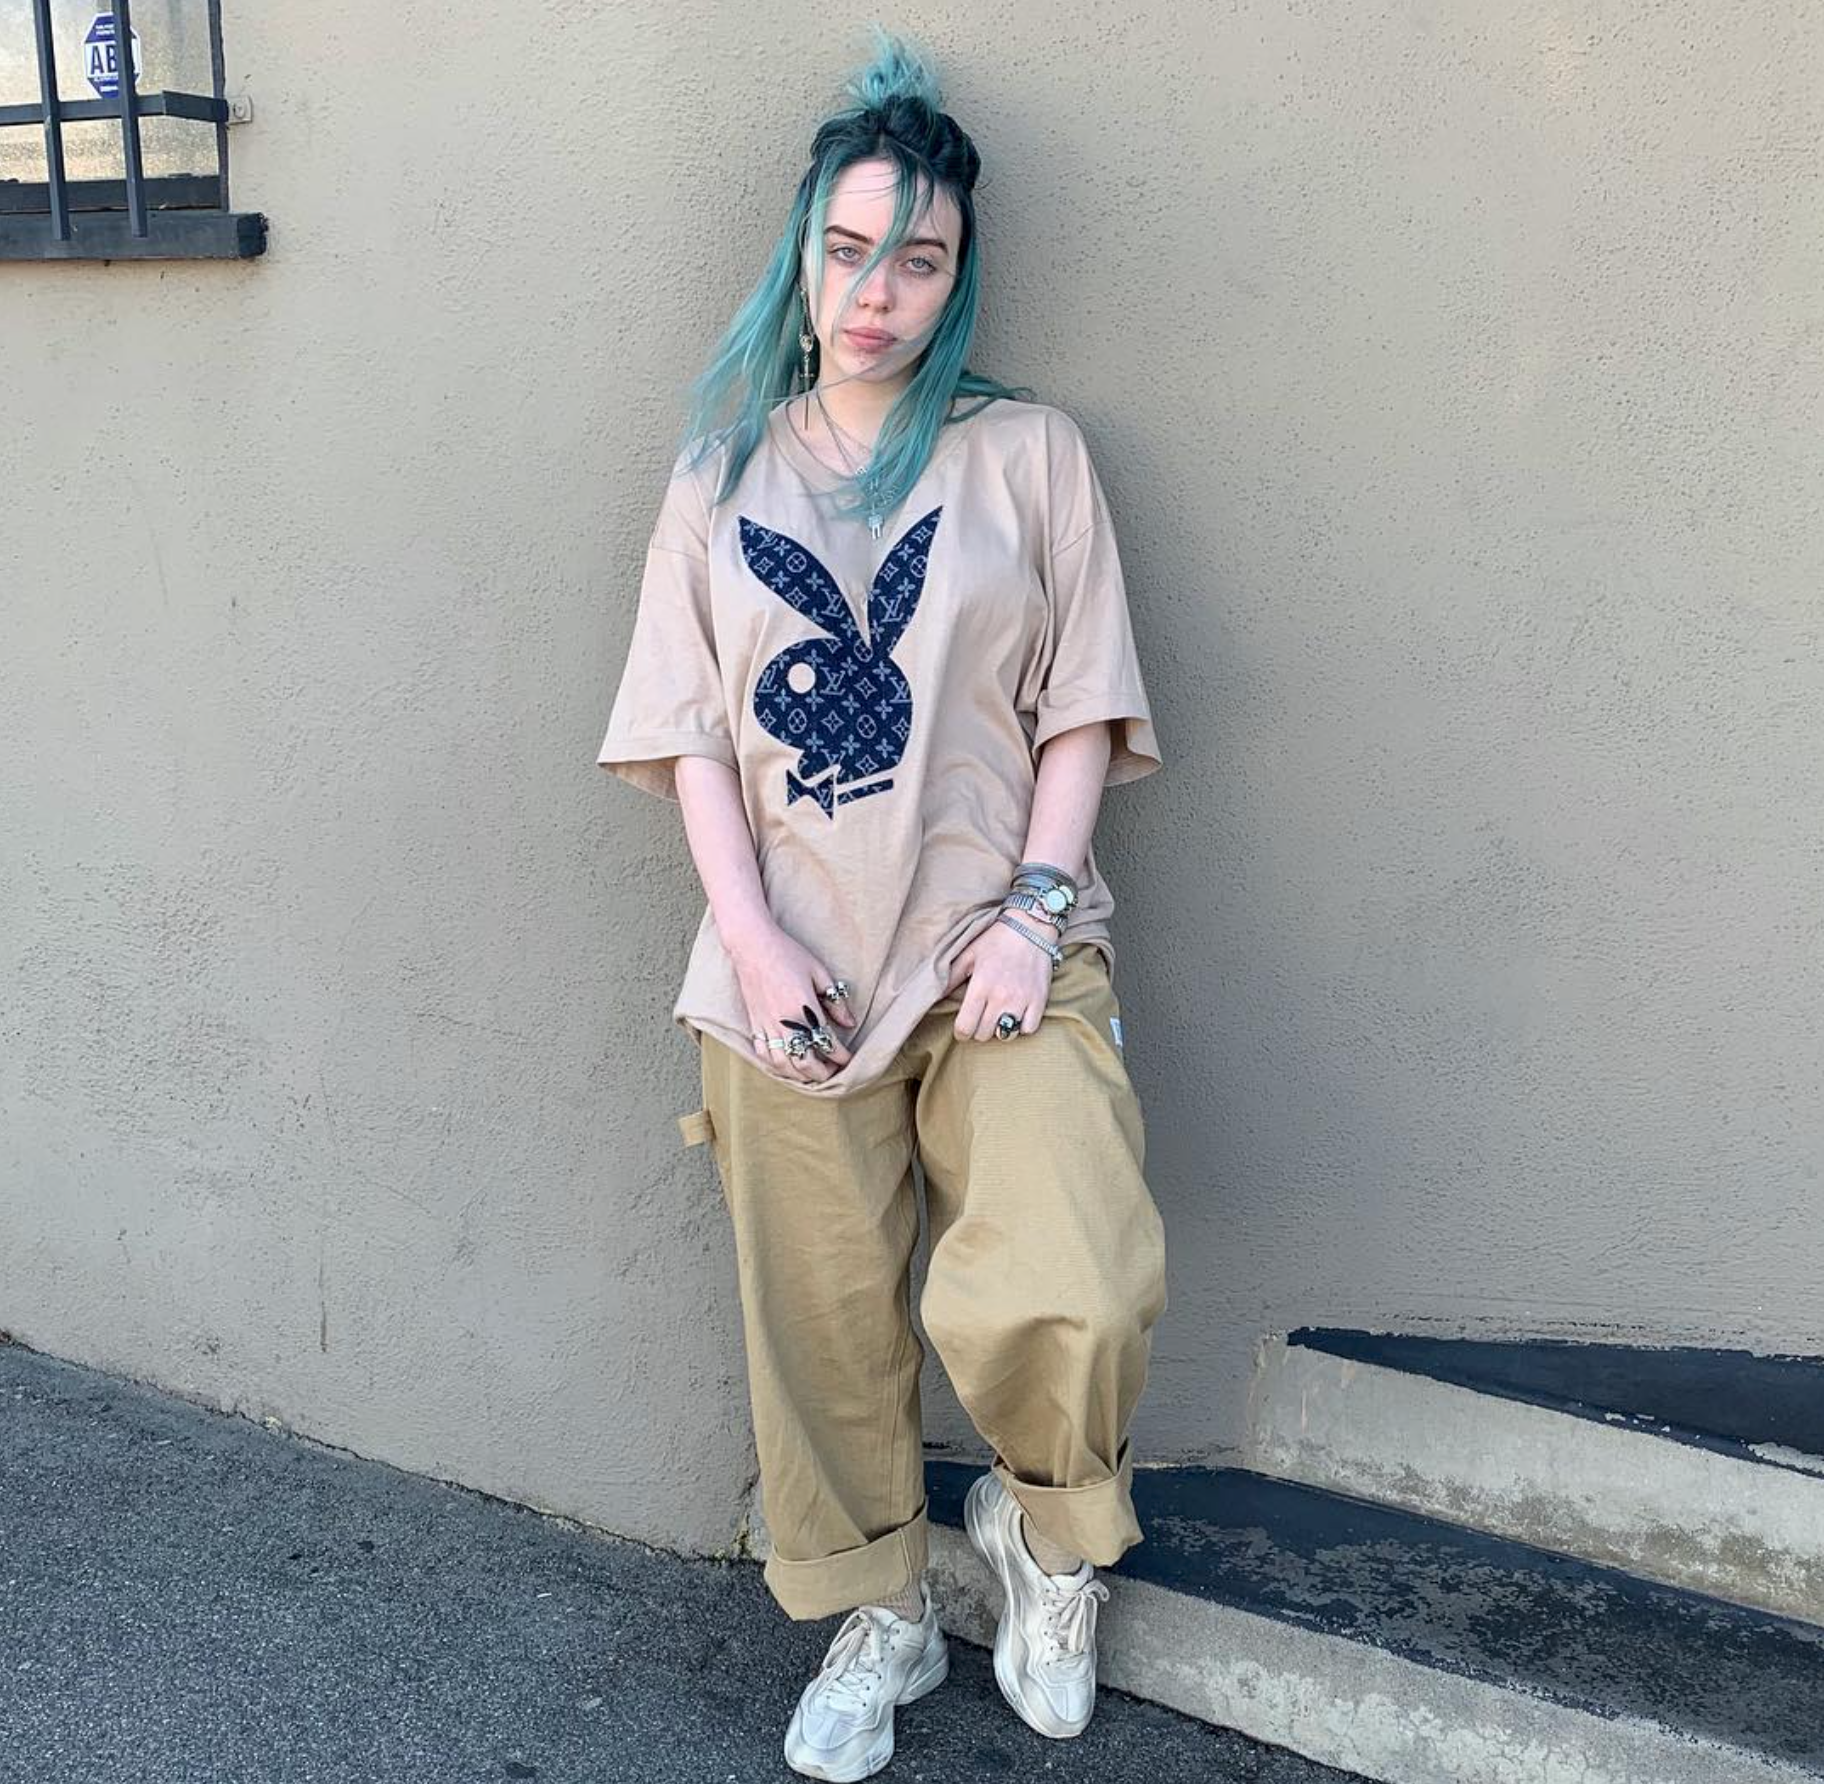 From Billie's    Instagram